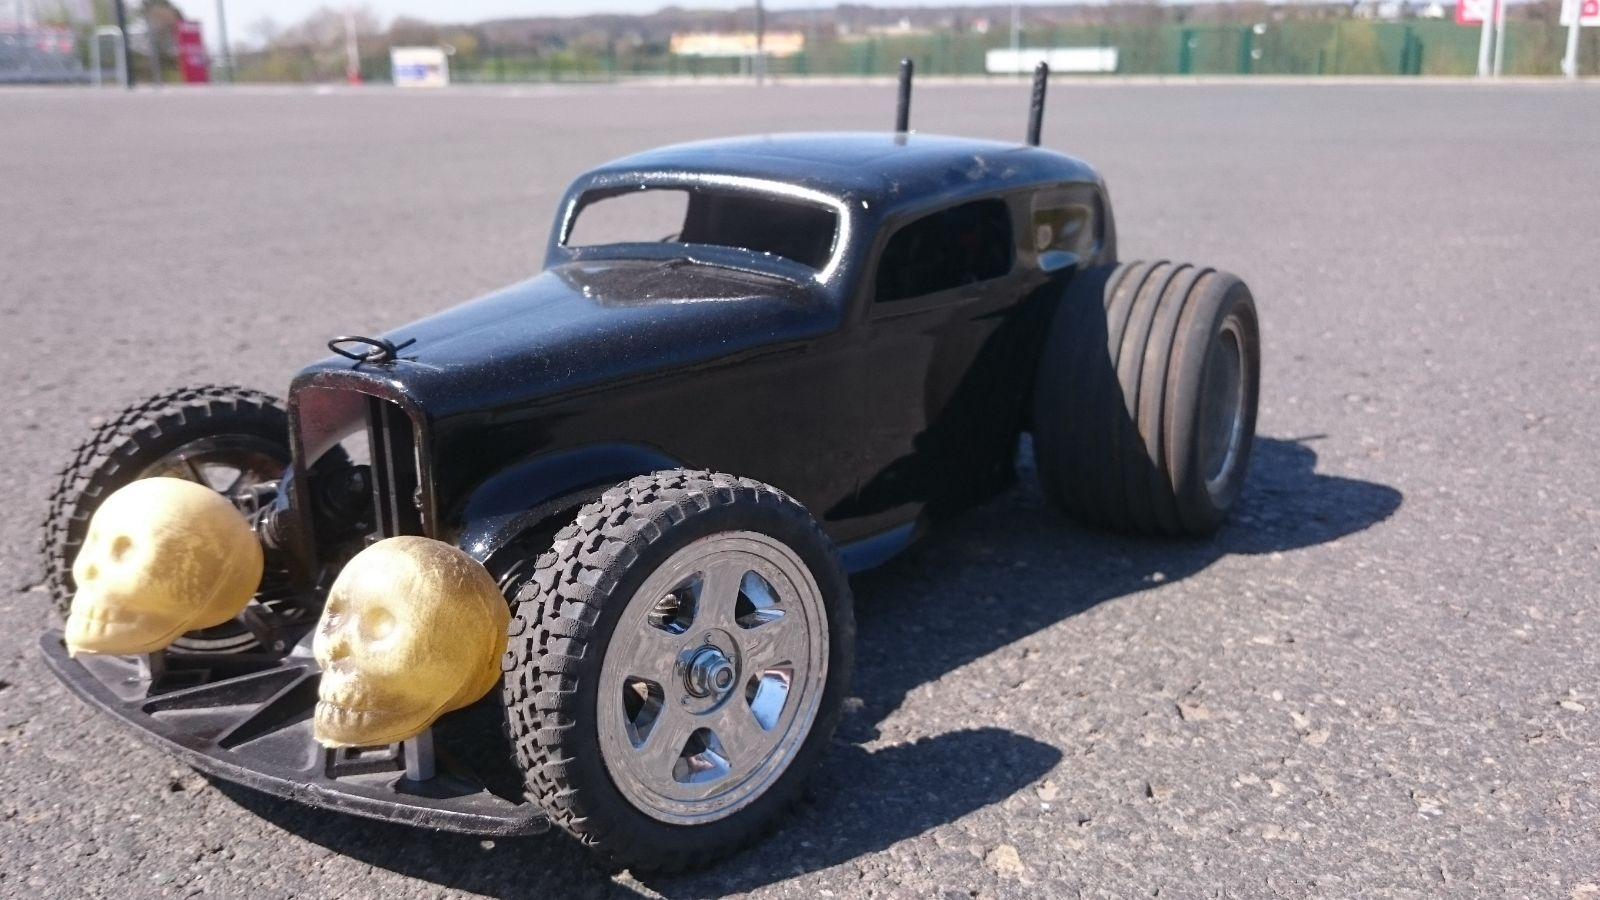 rc modellbau auto selber bauen ferngesteuerte rc autos. Black Bedroom Furniture Sets. Home Design Ideas